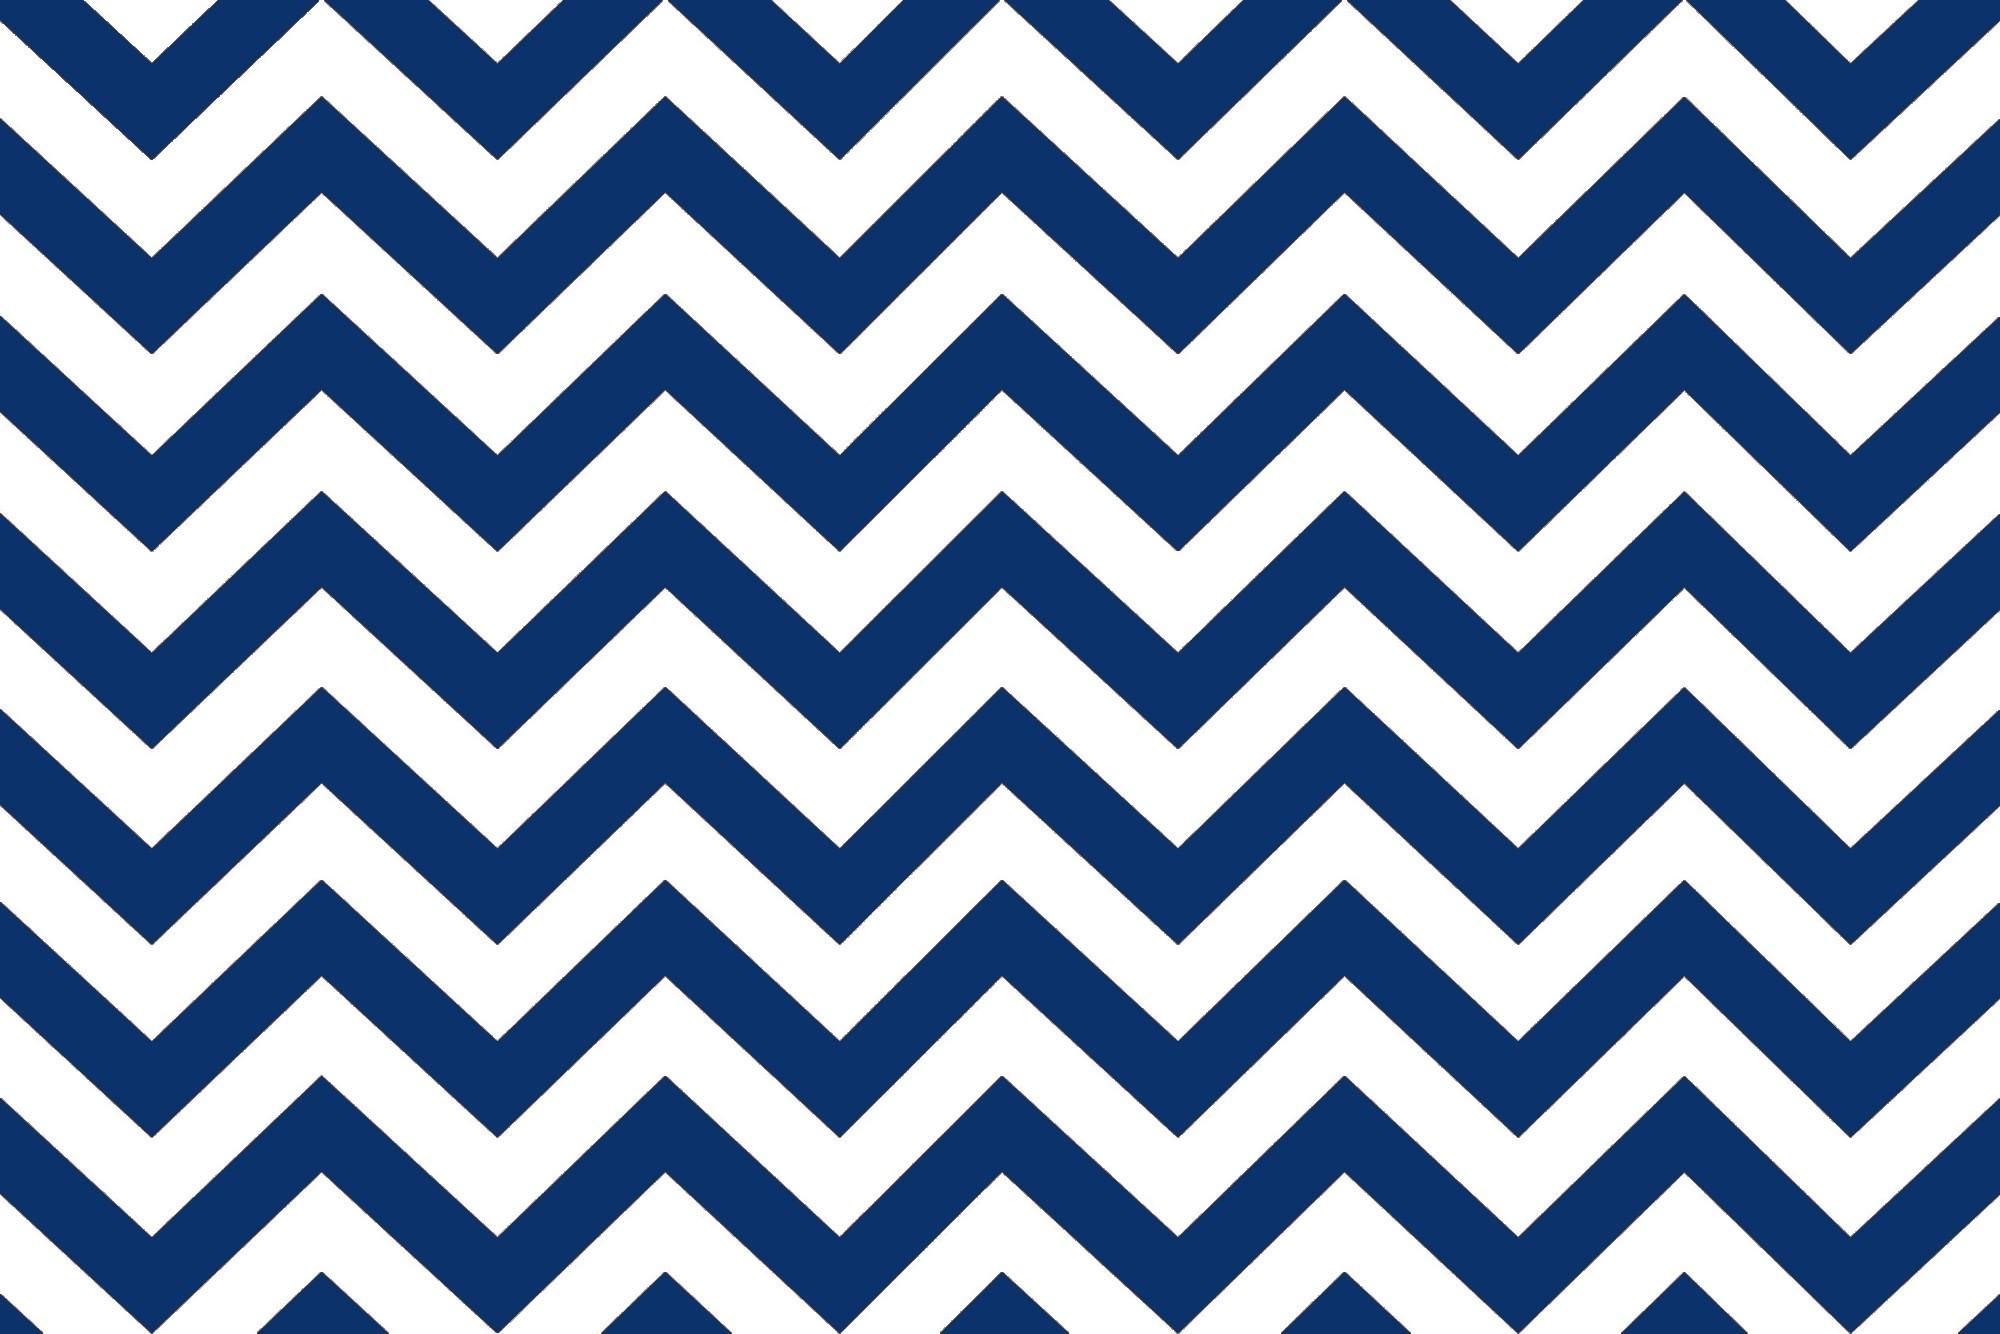 Home Design Blue Chevron Pattern Wallpaper Eclectic Expansive